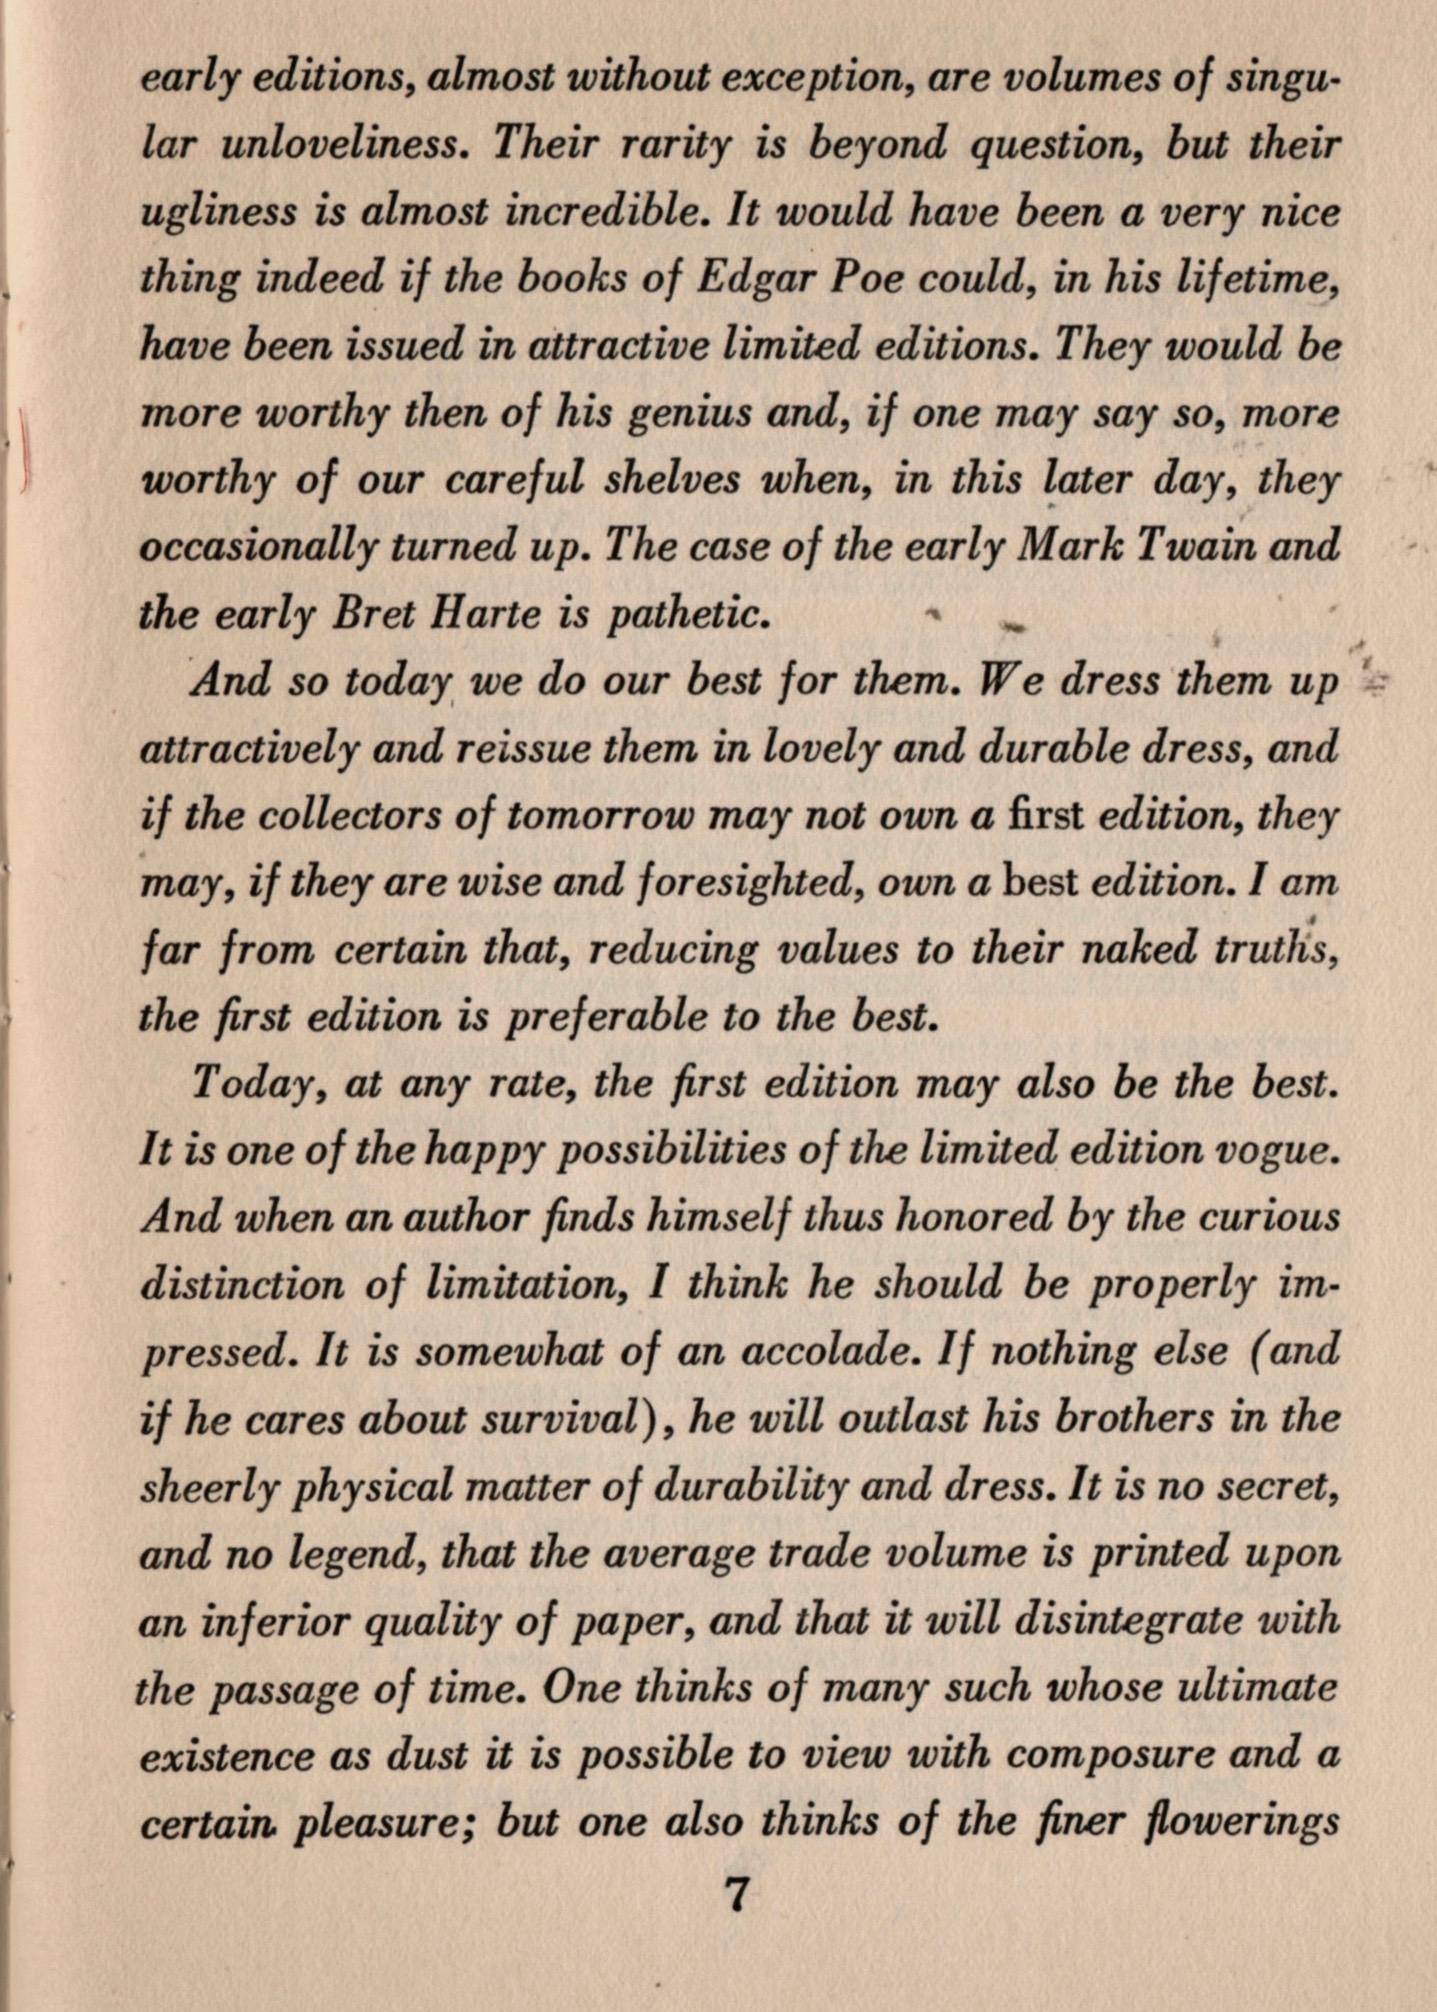 Covici Friede catalogue 1929 Page 5.jpeg